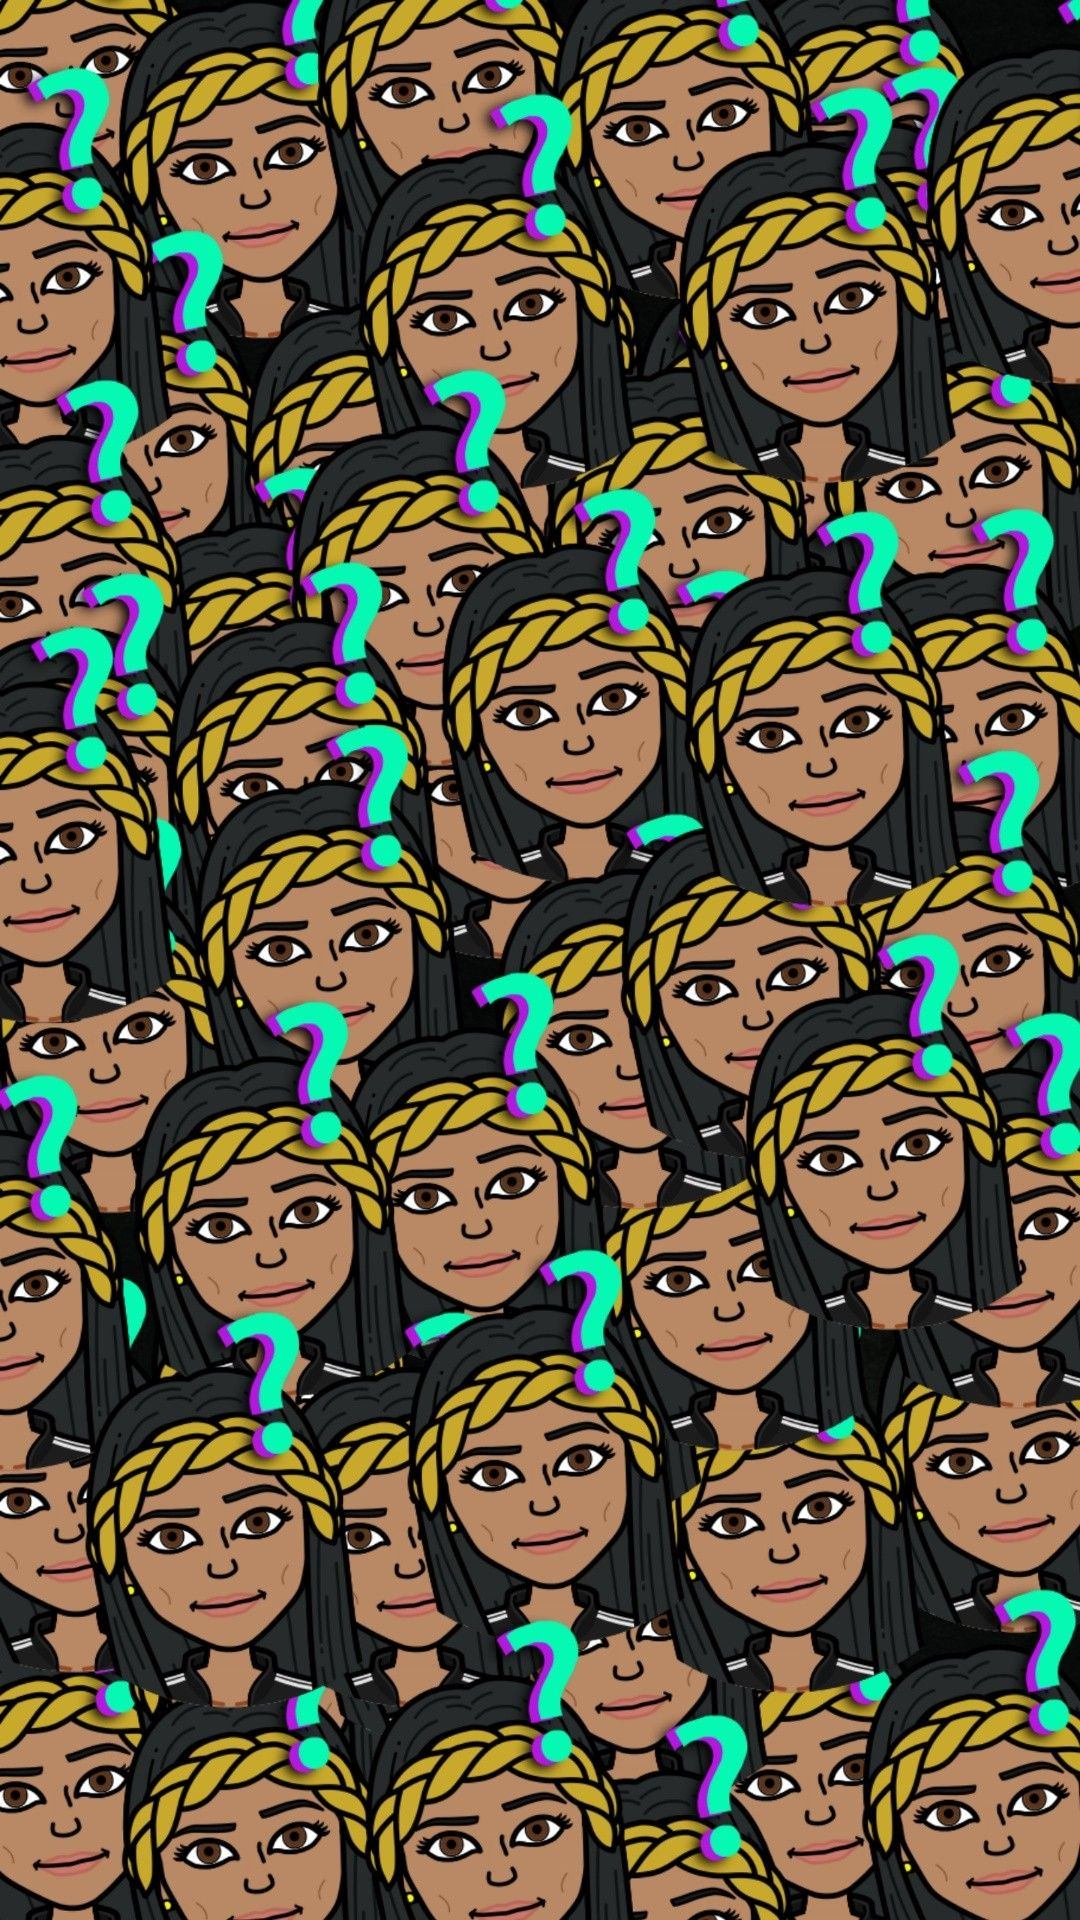 Bitmoji wallpaper Emoji wallpaper, Wallpaper backgrounds